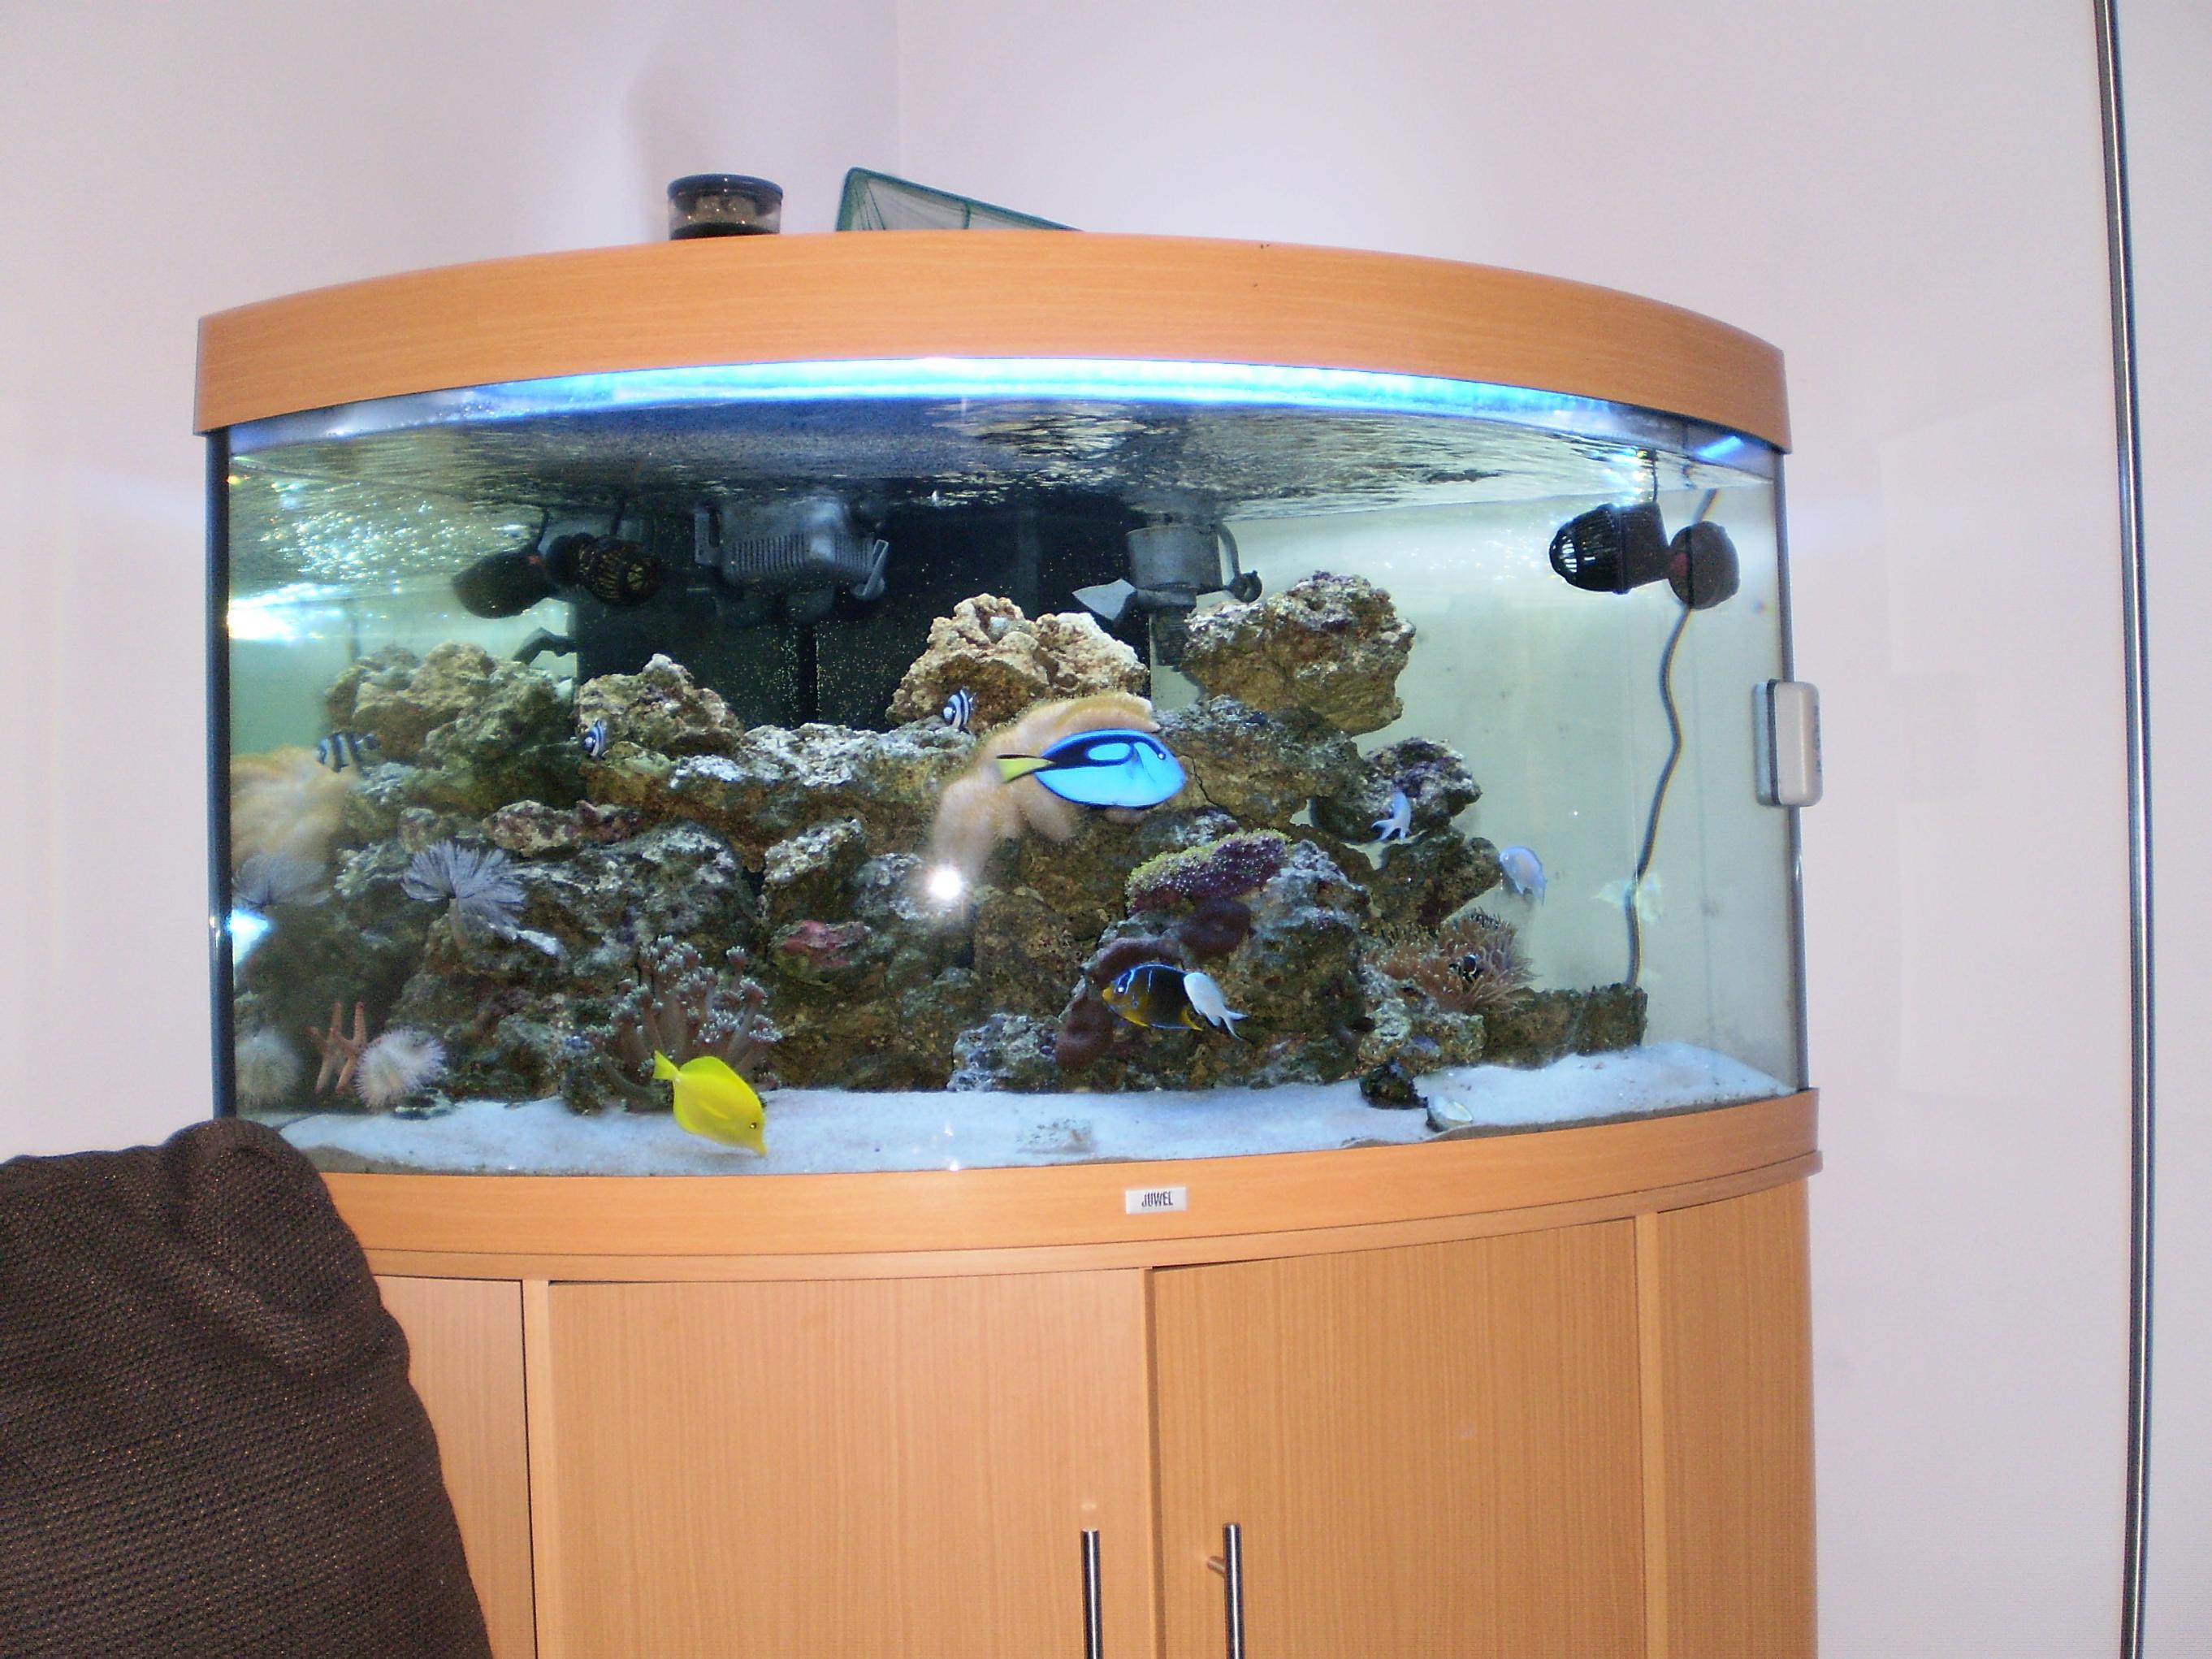 Aquarium fish tank sale uk - Jewel Trigon For Sale Or Swap 012 Jpg